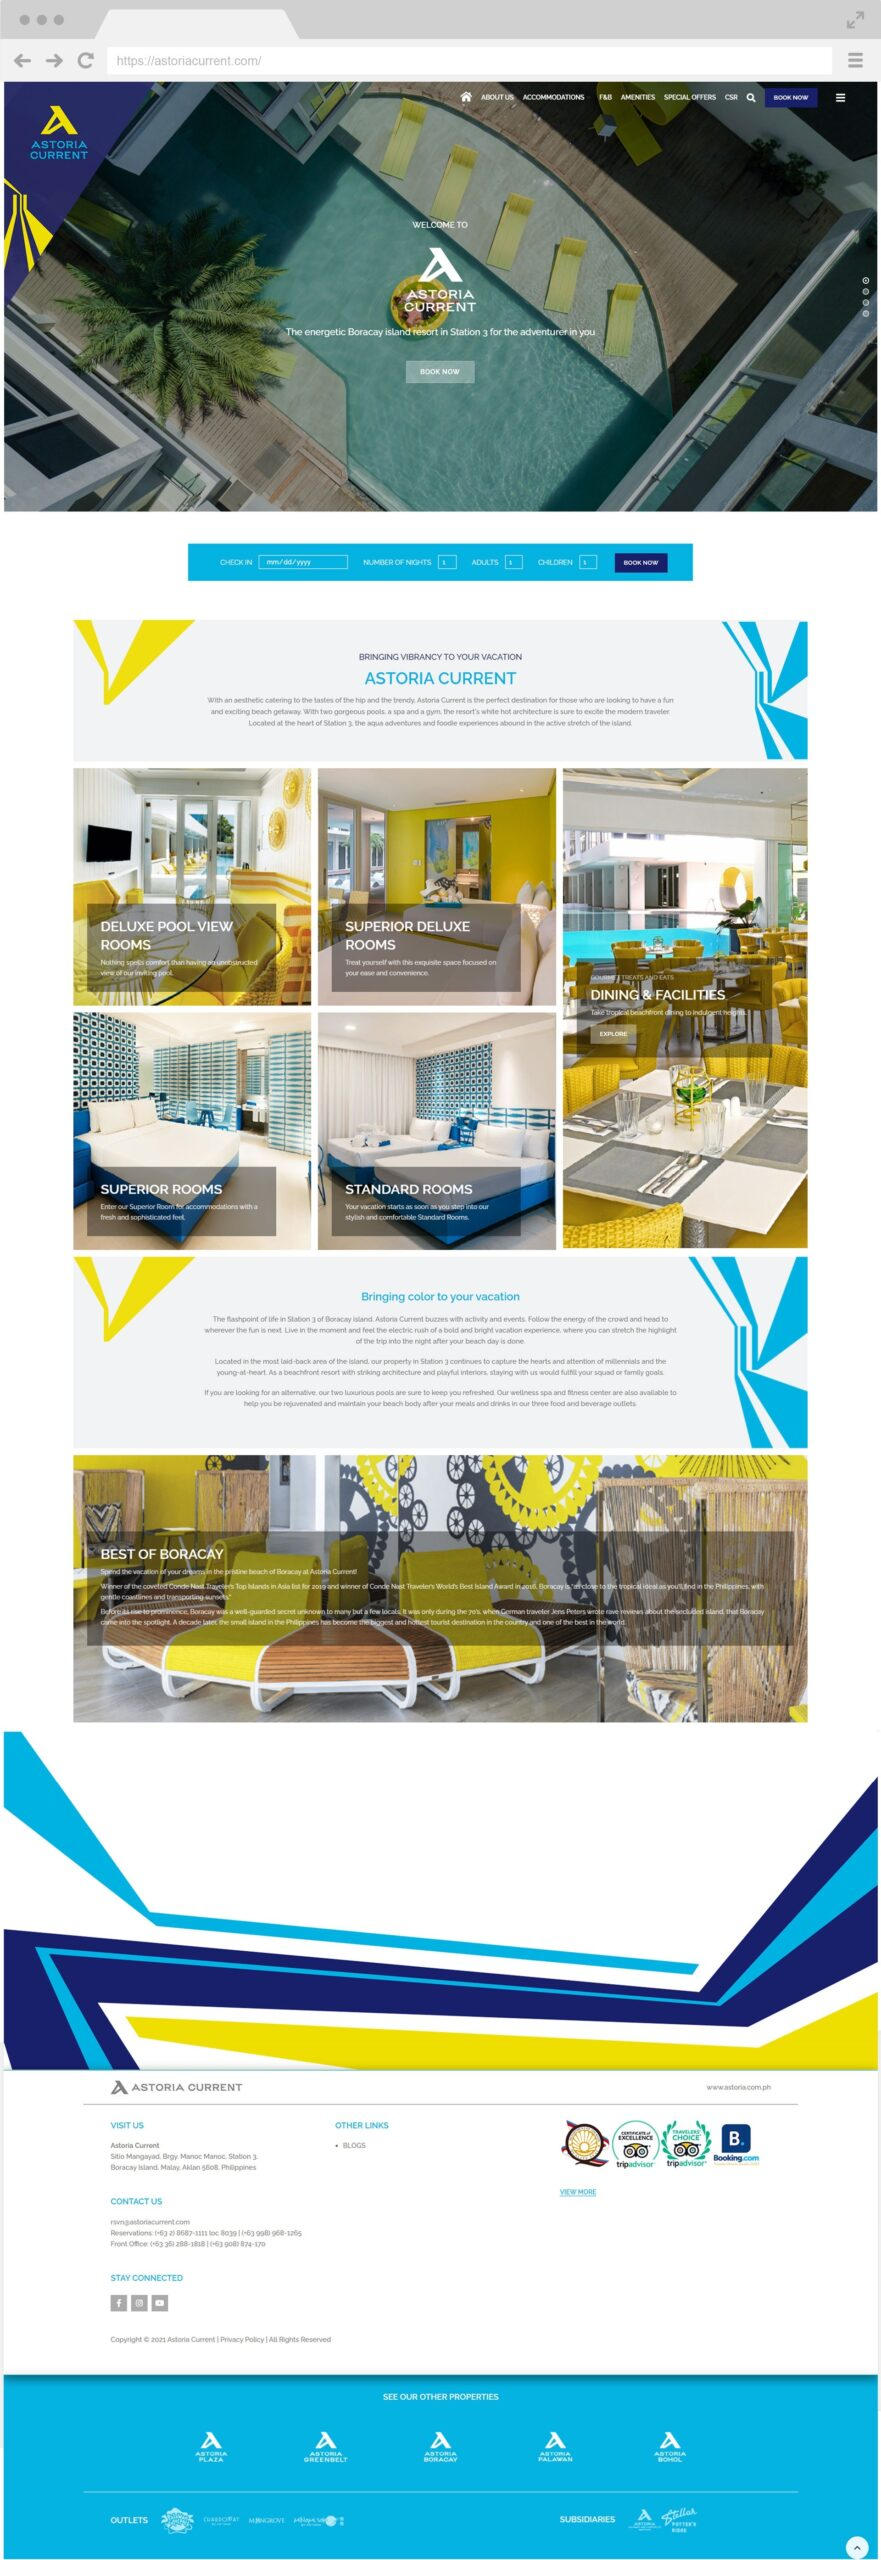 Astoria Current Homepage